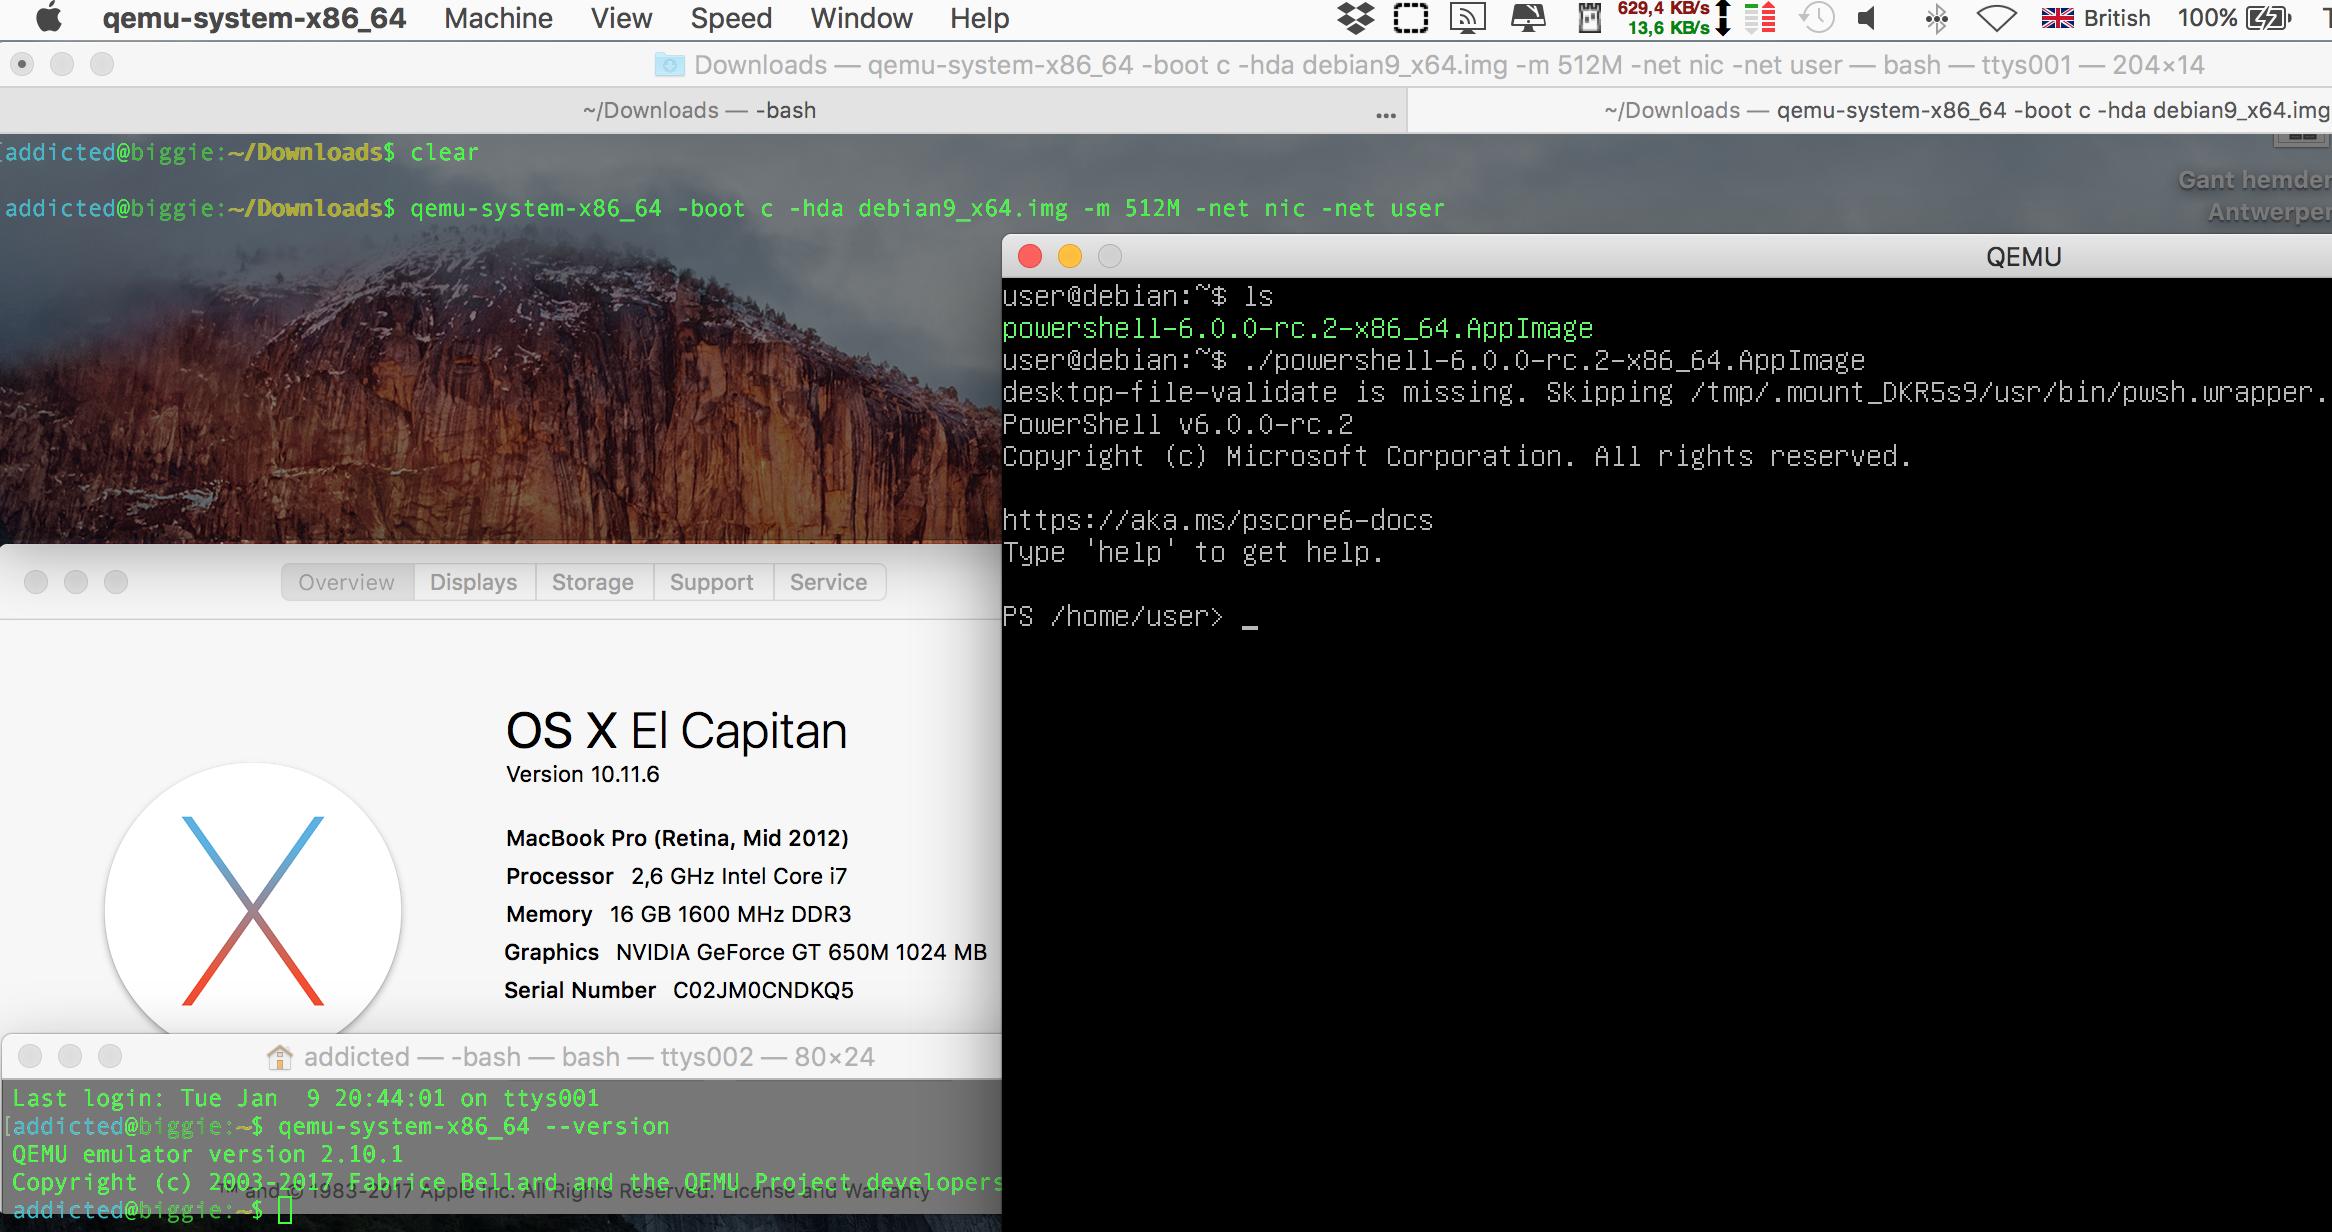 Day 9 MBp Qemu Debian Powershell.png